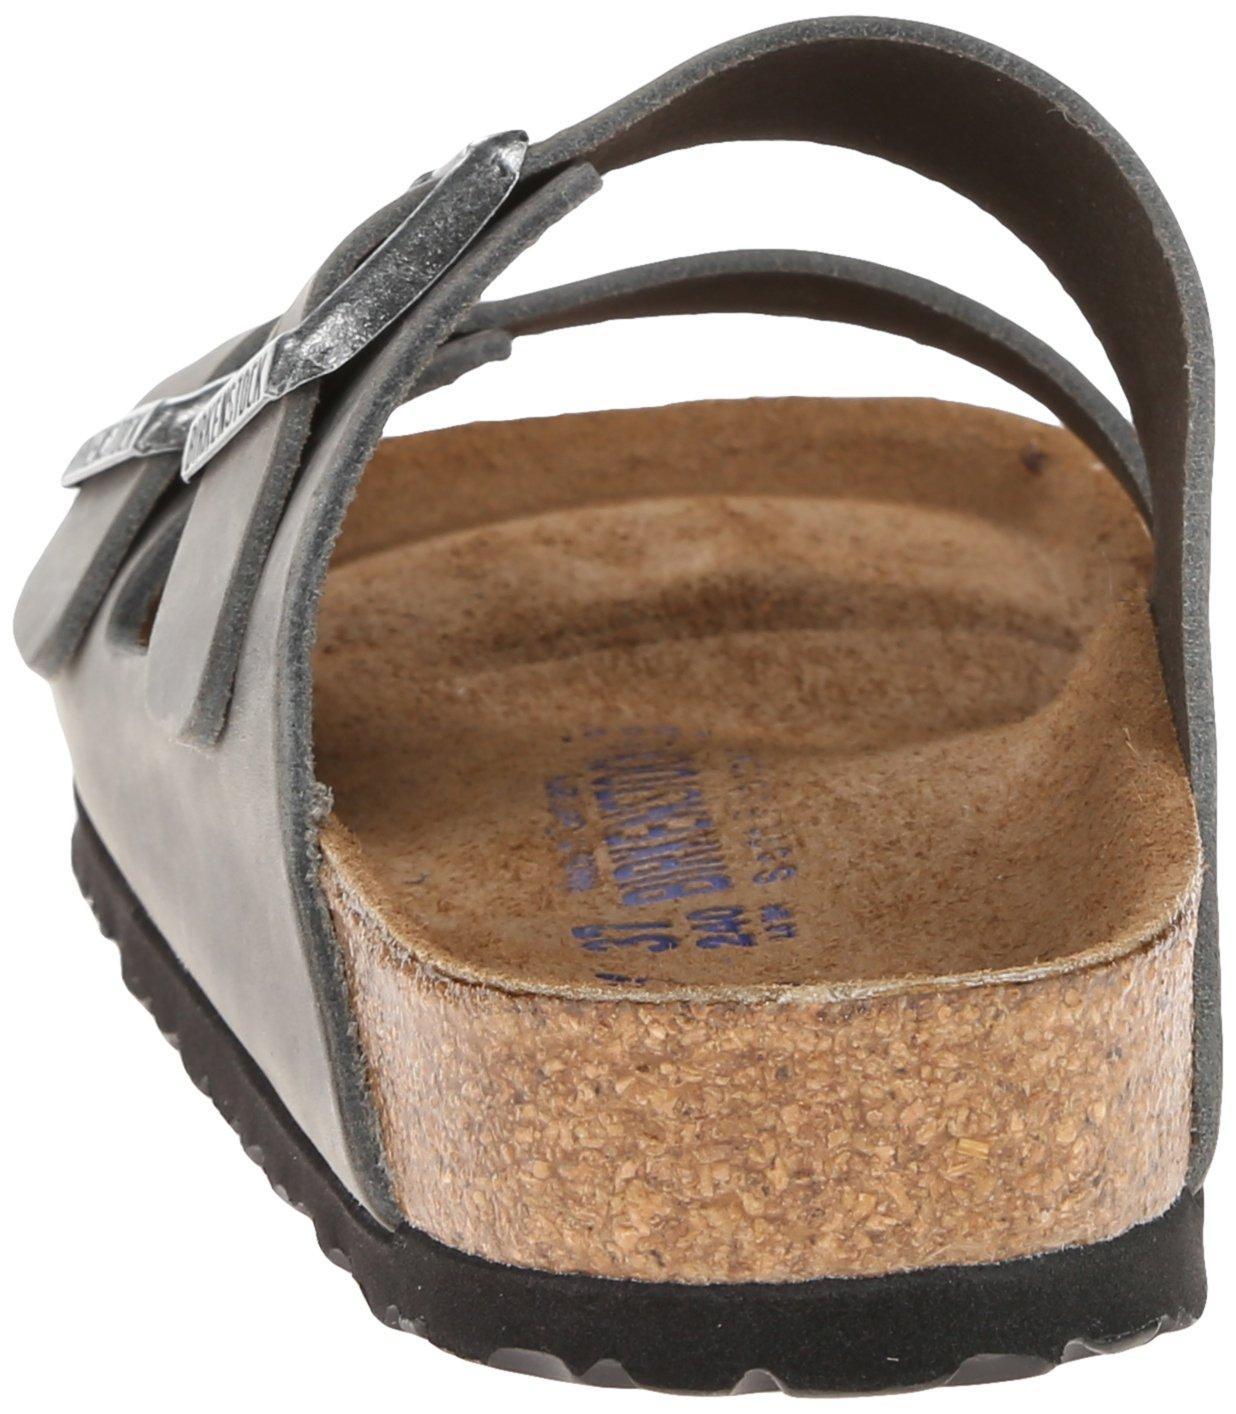 Birkenstock Unisex Arizona Iron Oiled Leather Sandals - 45 M EU/12-12.5 B(M) US Men by Birkenstock (Image #2)